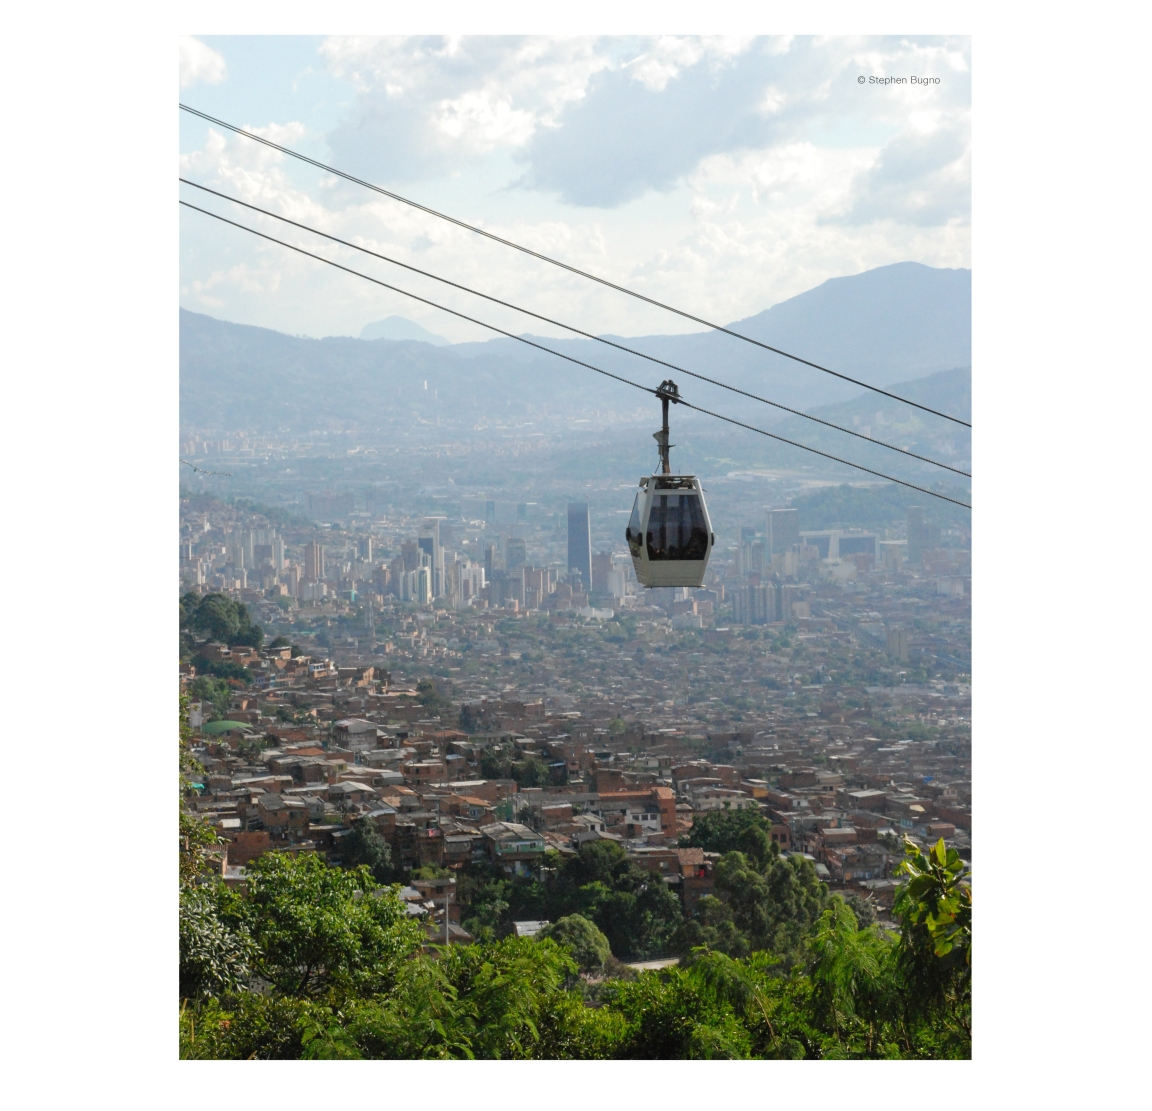 Medellin - Foto Cablecar